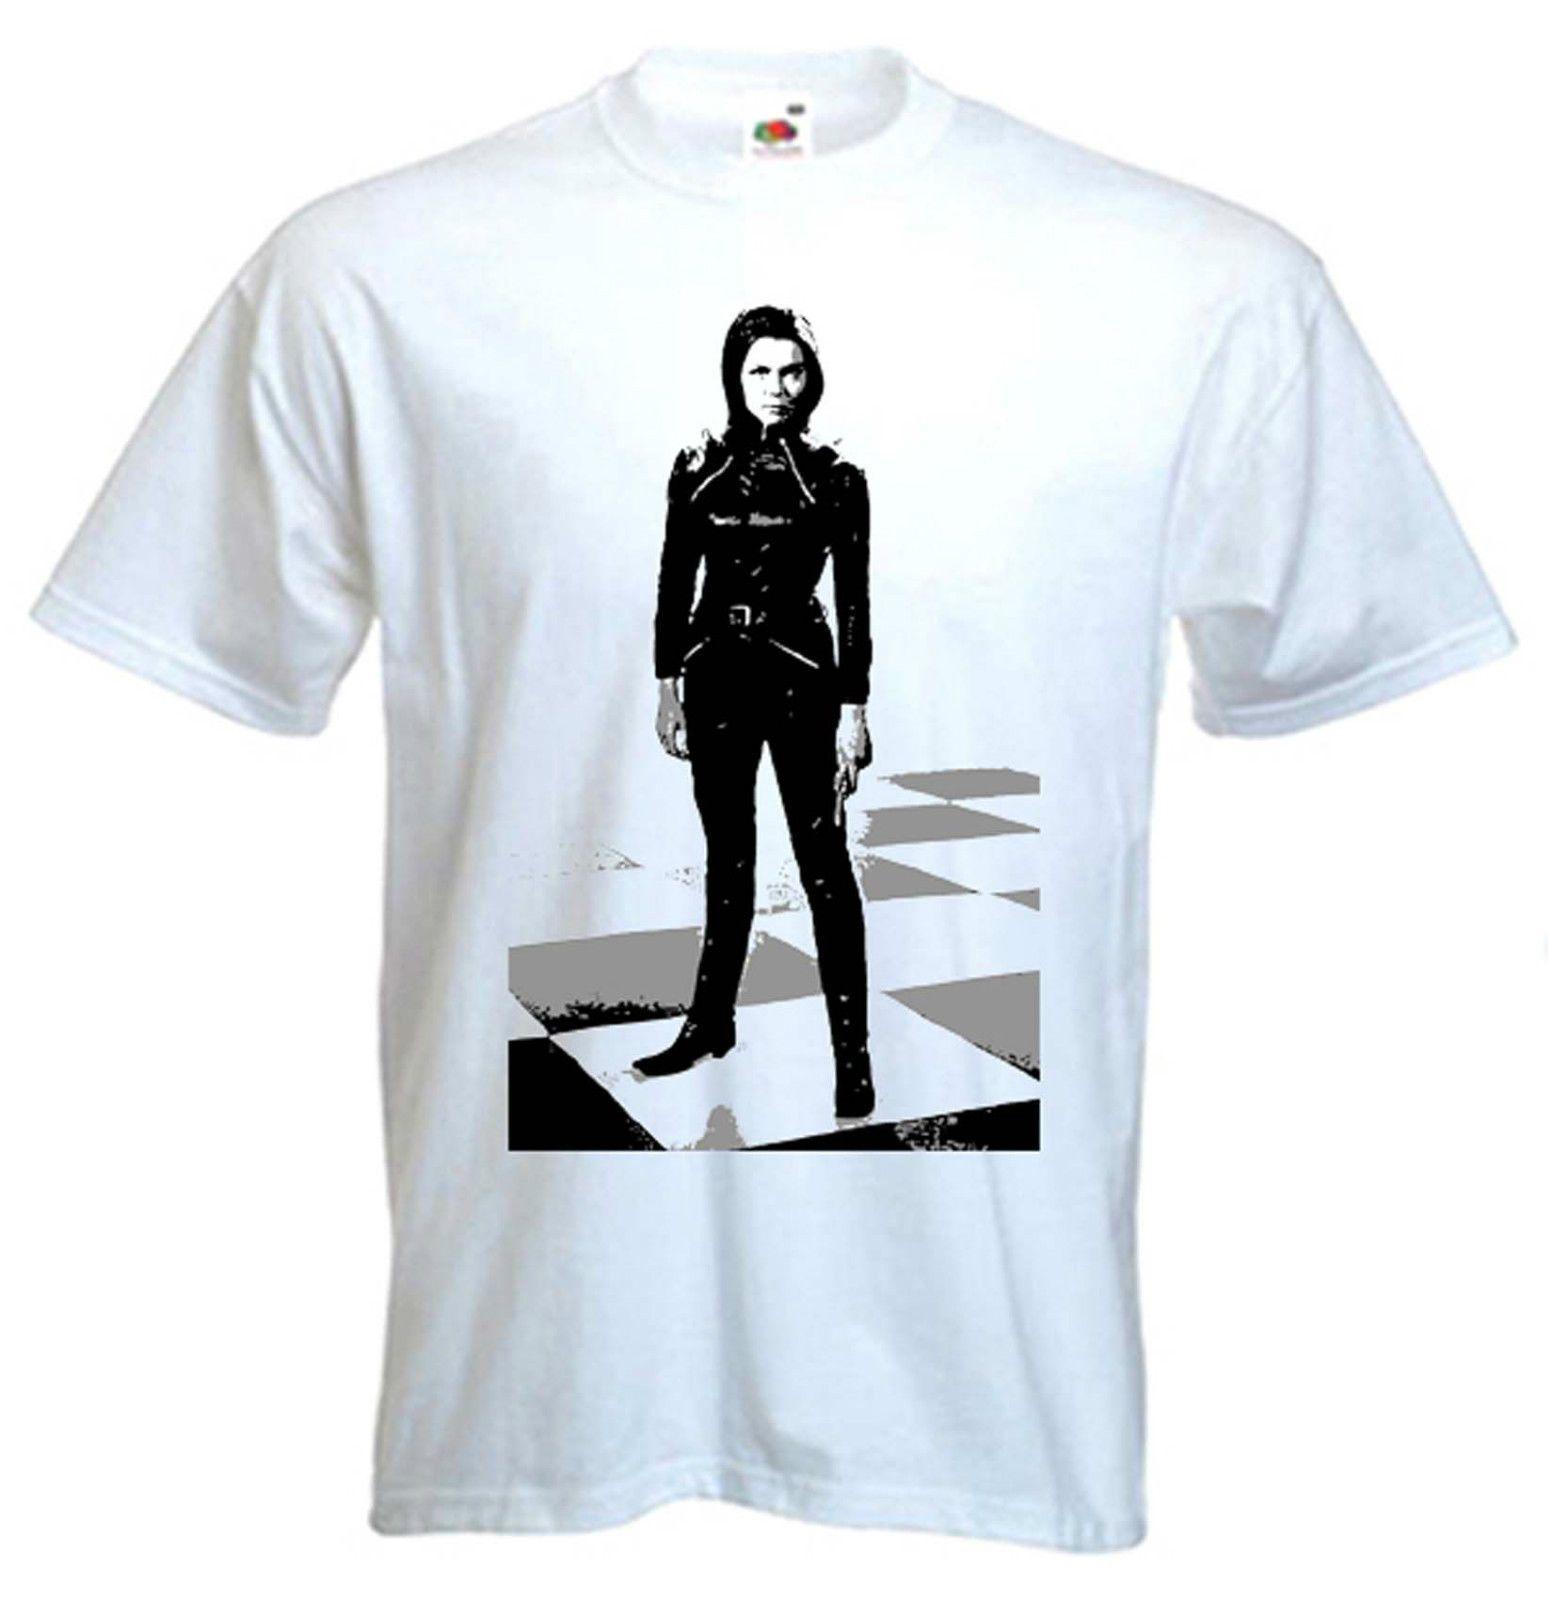 51f65e4e4acd5 Emma Peel T-Shirt Diana Rigg The Avengers Sz S-XXXL Funny free shipping  Unisex Casual